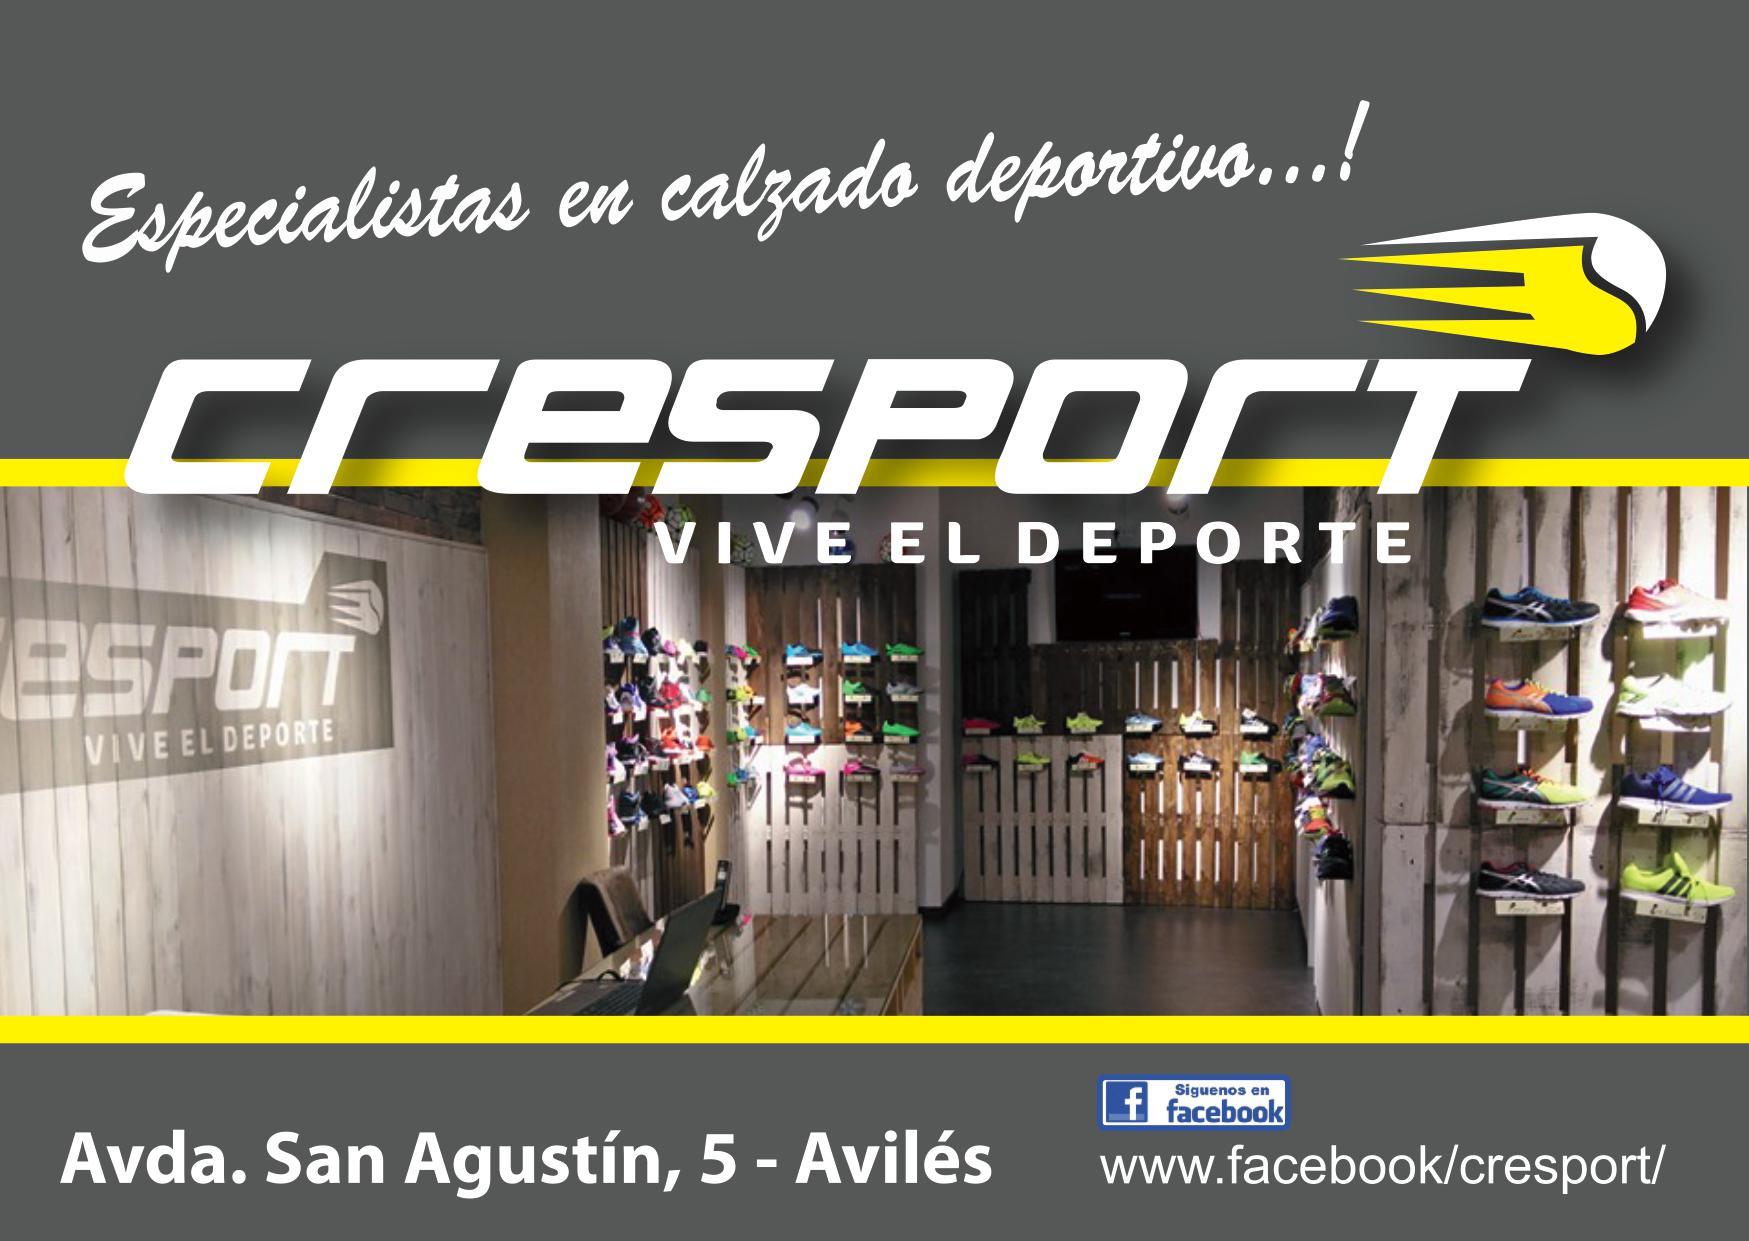 Cresport